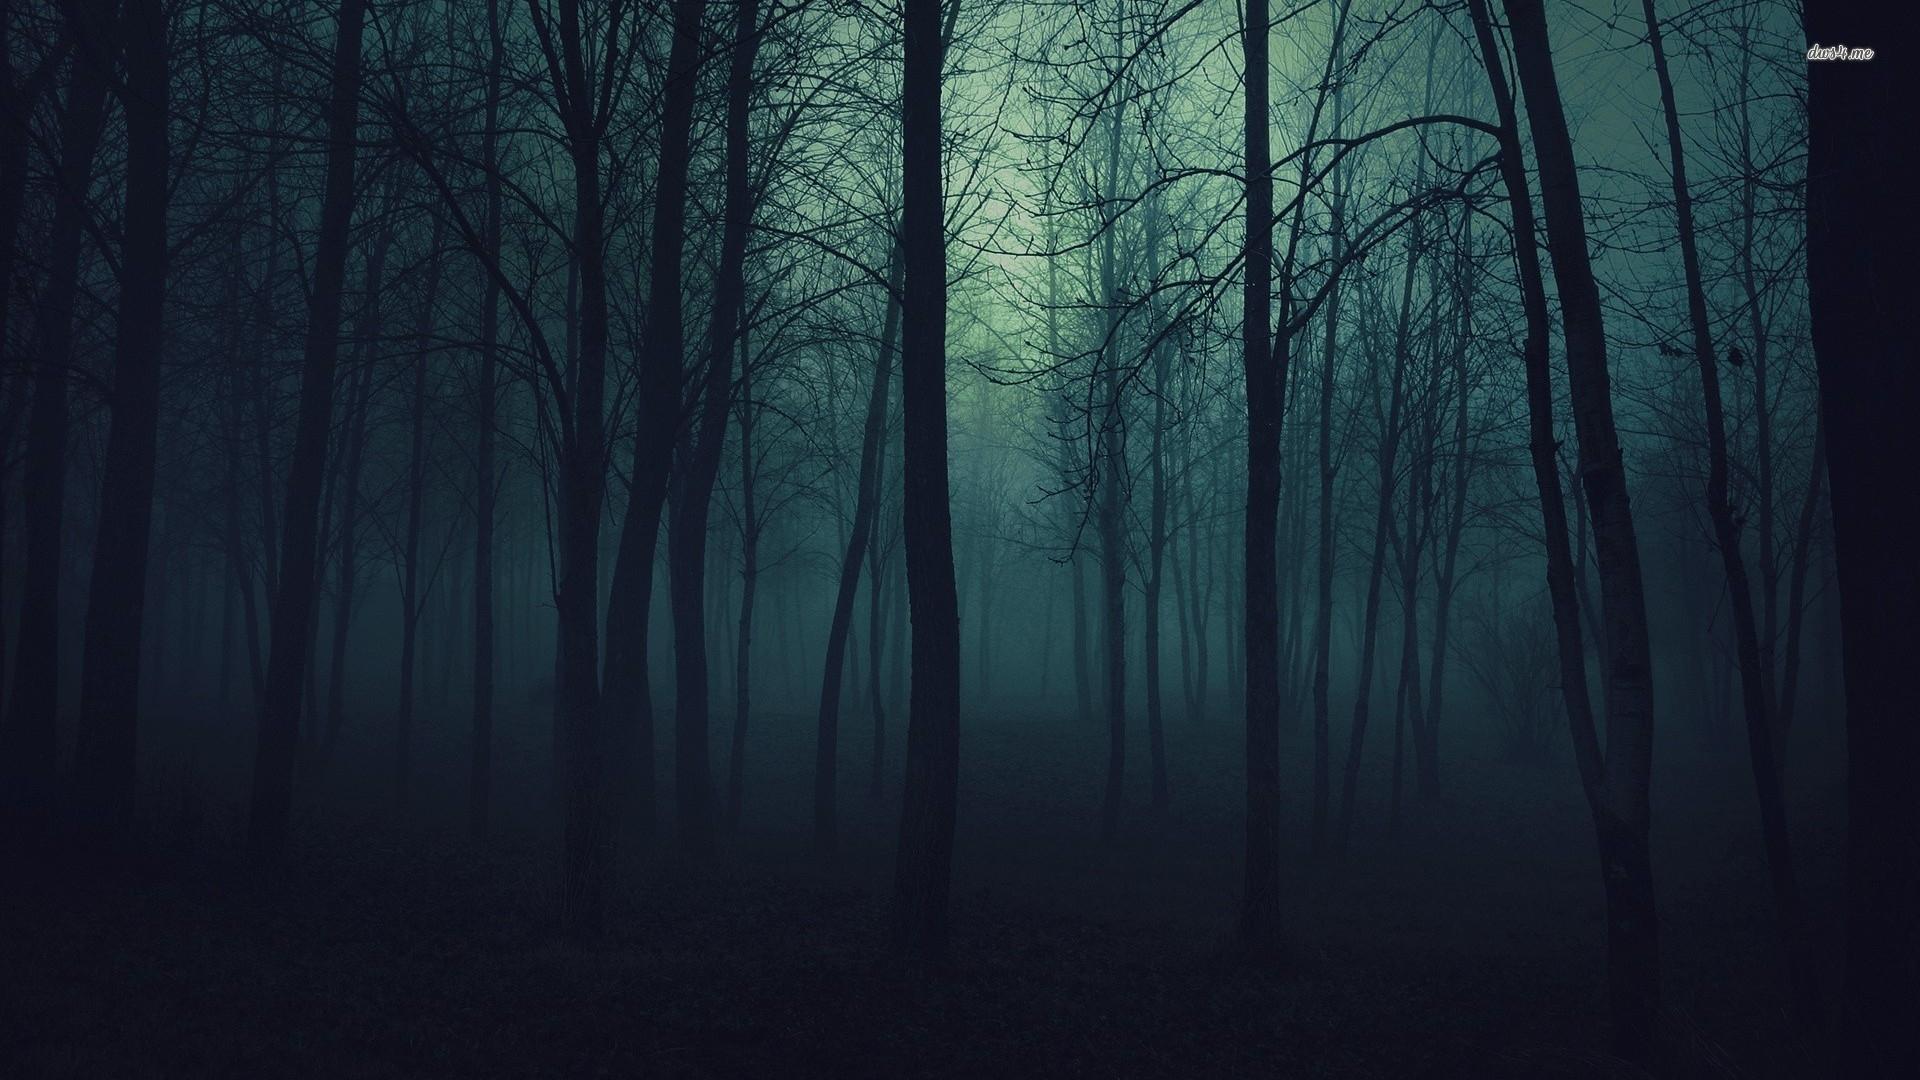 dark forest tumblr - Поиск в google | tattoos | pinterest | dark forest